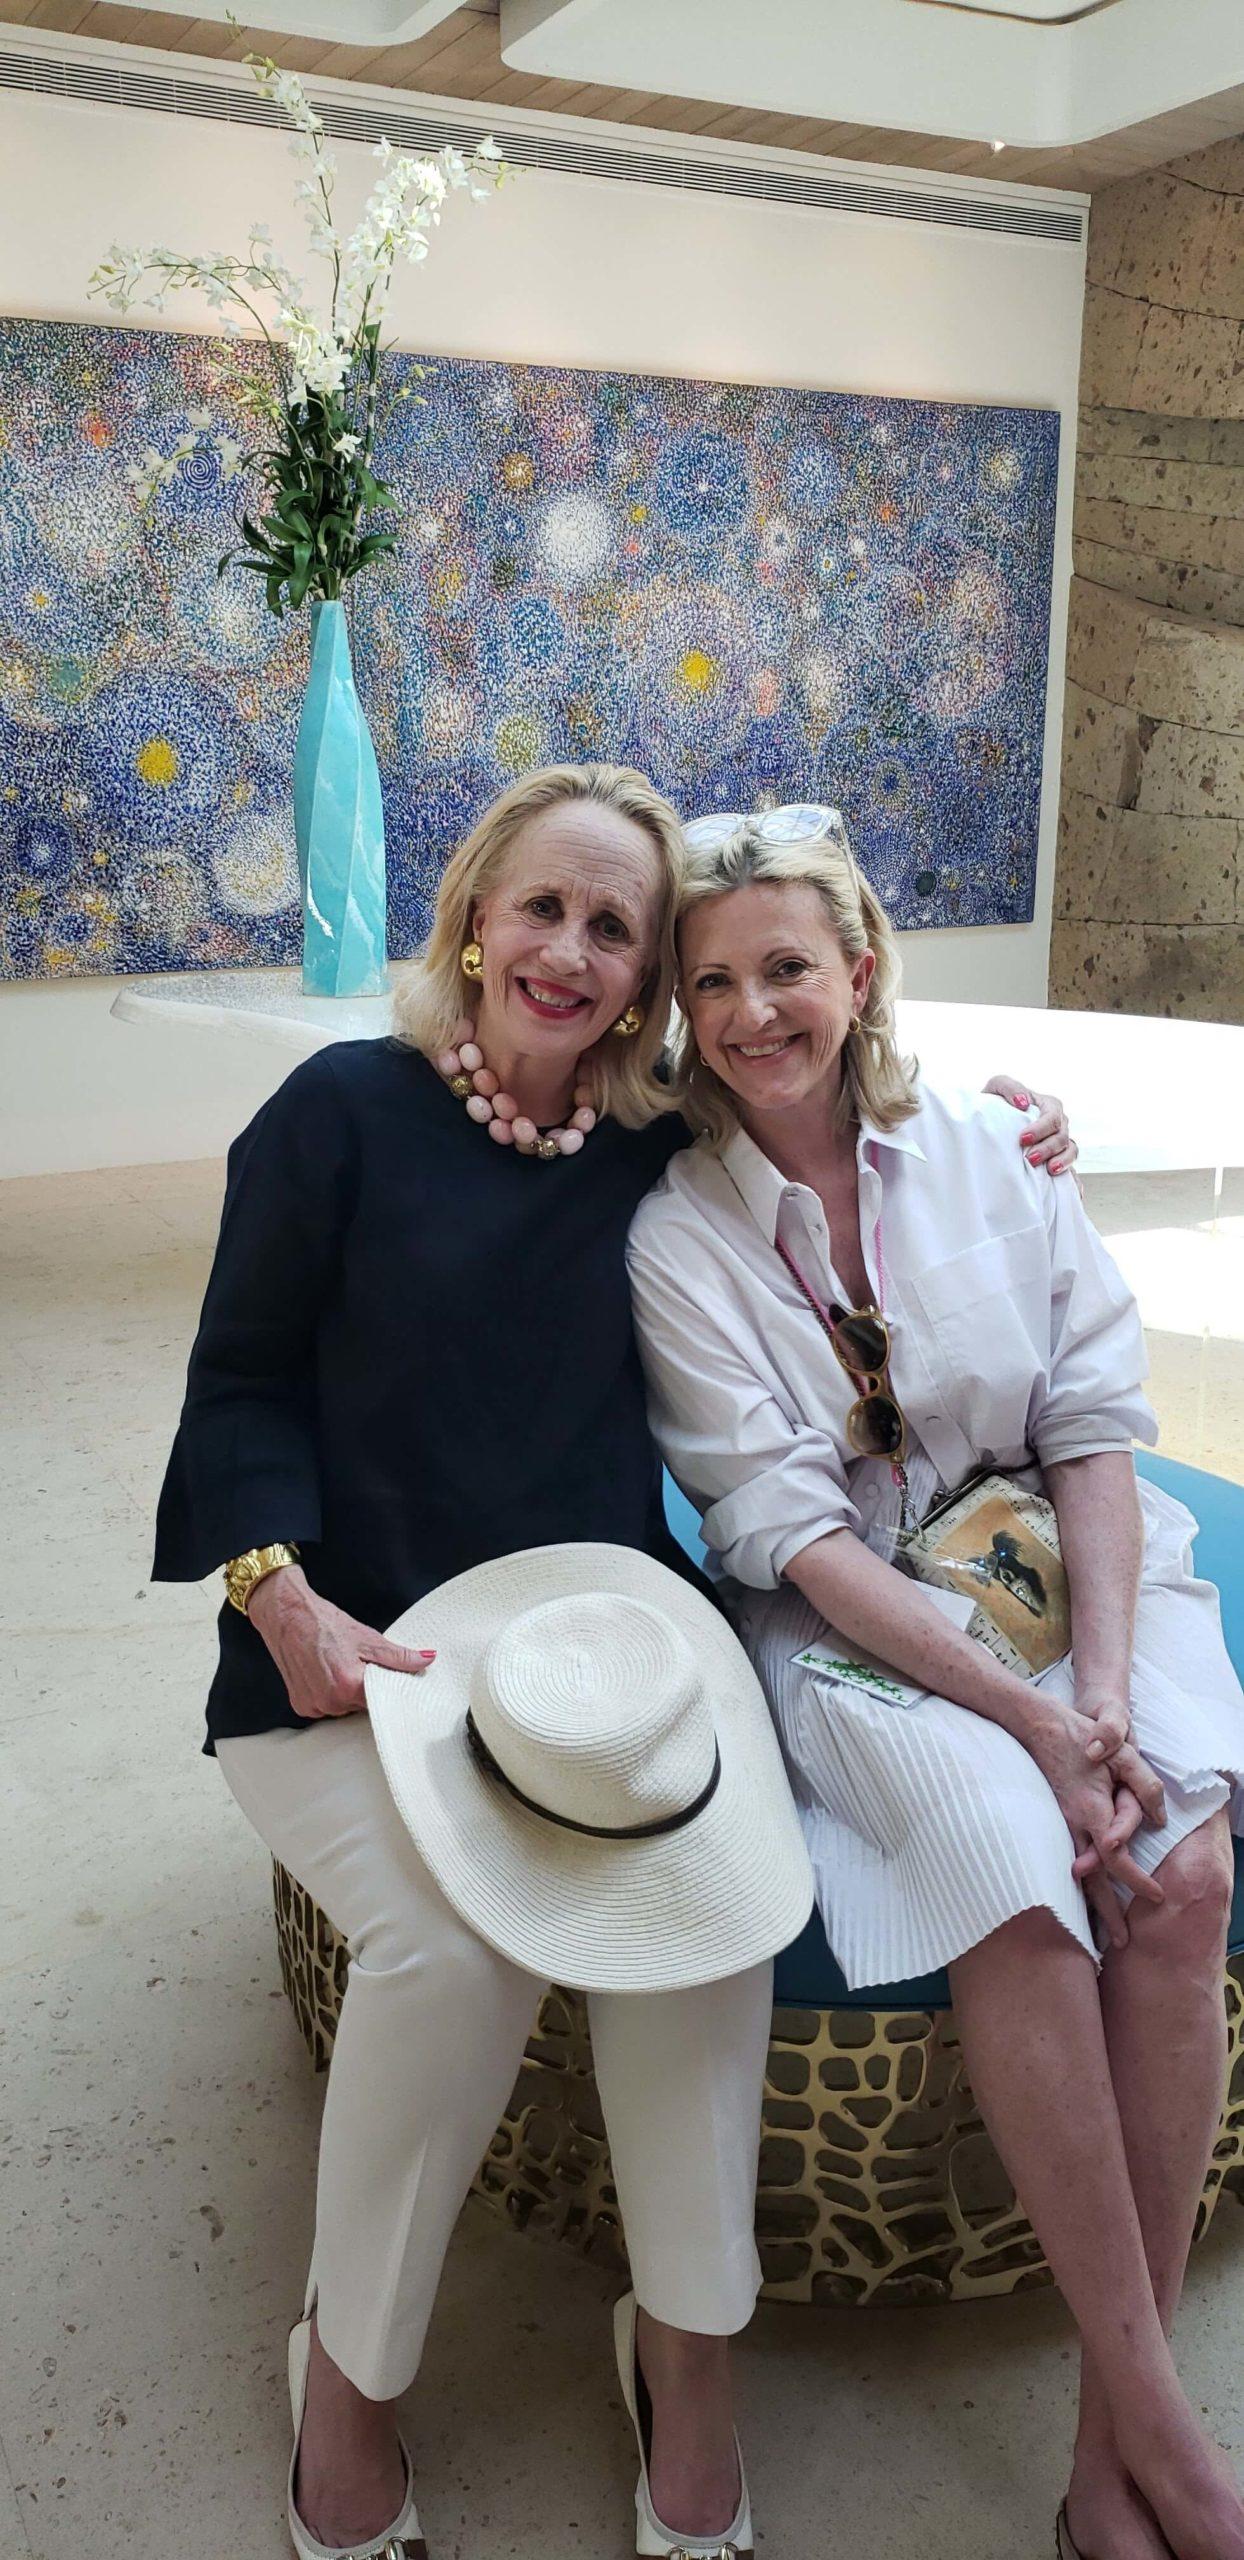 Charlotte Tripplehorn and Ann Barbier-Mueller SILHOUETTE